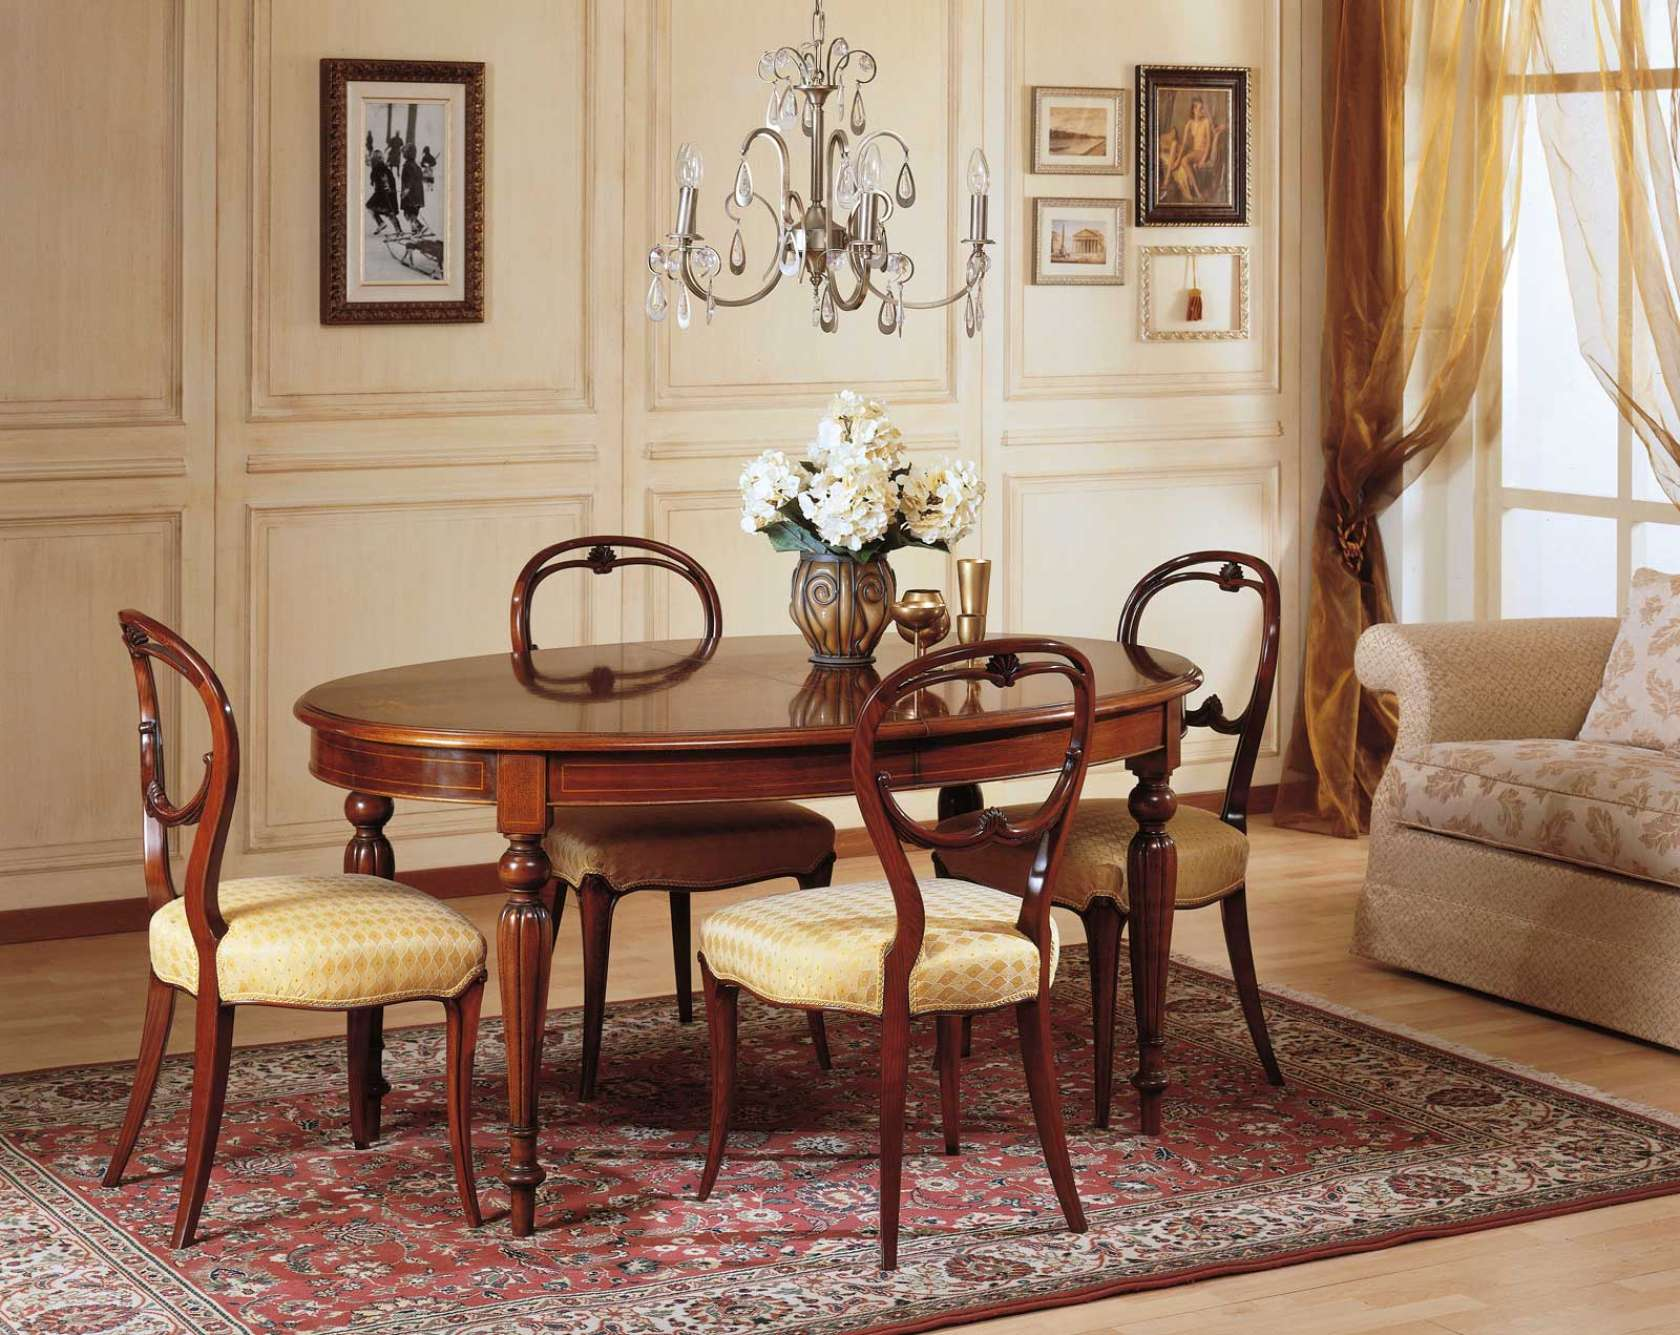 Sedie Ottocento Francese : Sala da pranzo classica 800 francese vimercati meda